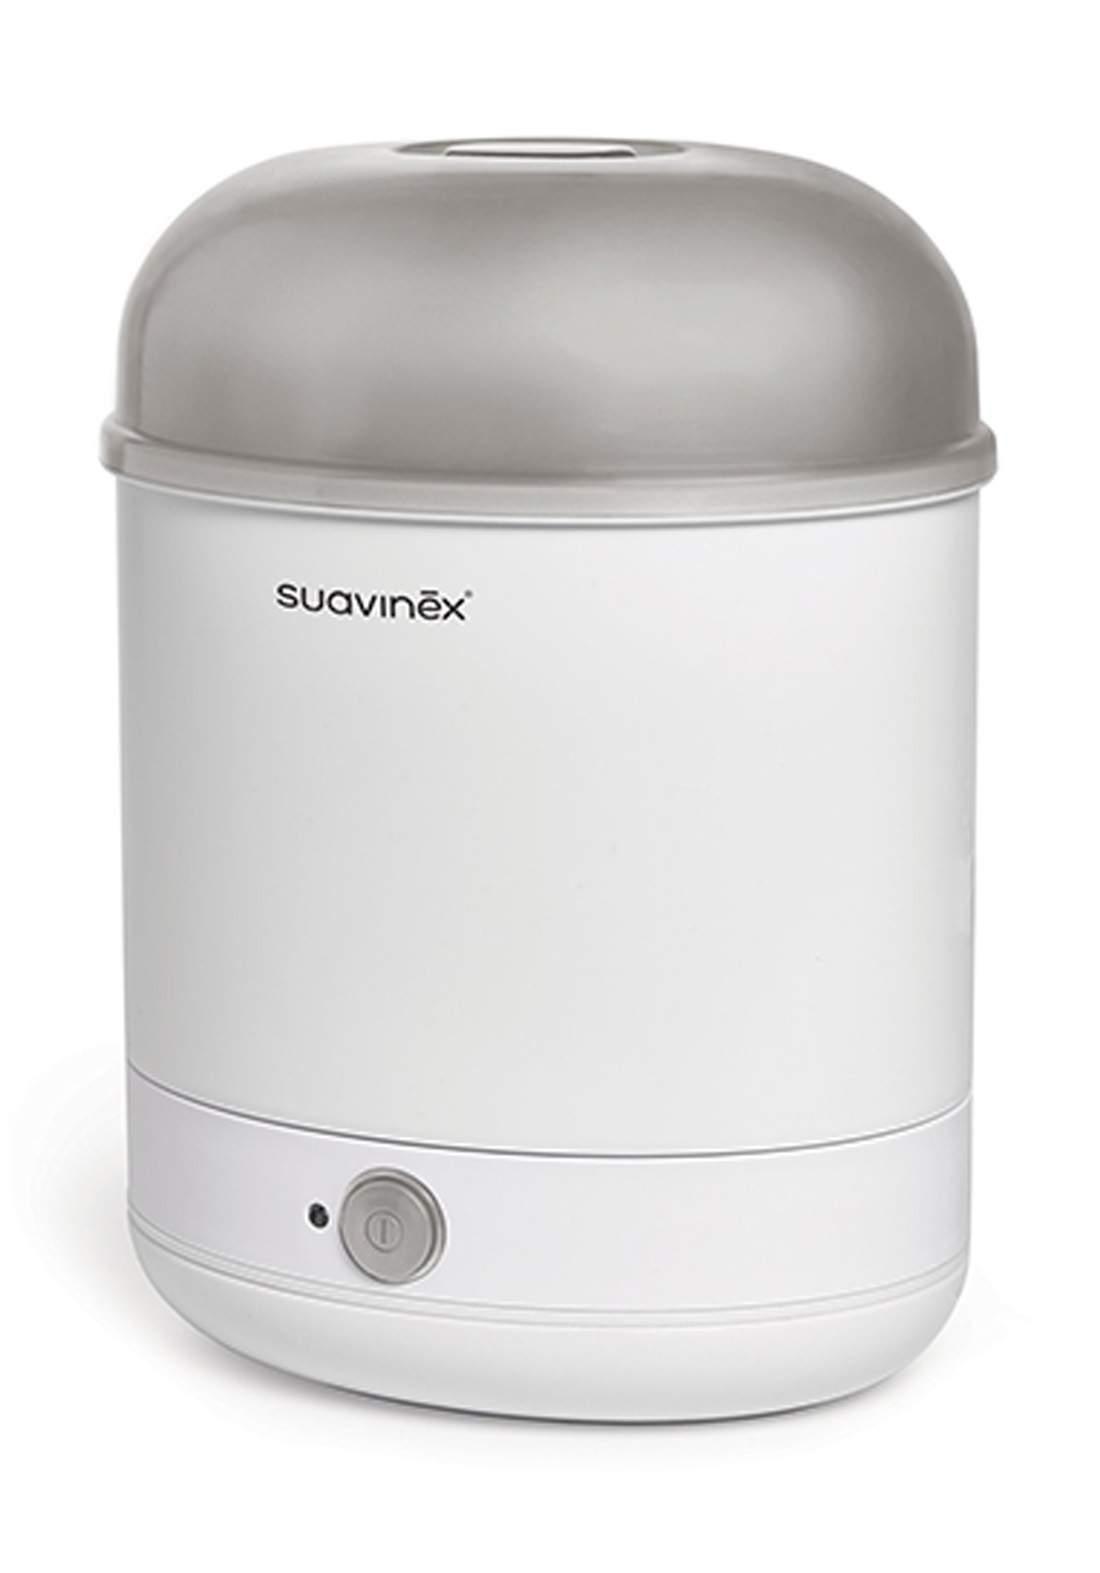 Suavinex Electric Steam Sterilizer جهاز تعقيم رضاعات الاطفال